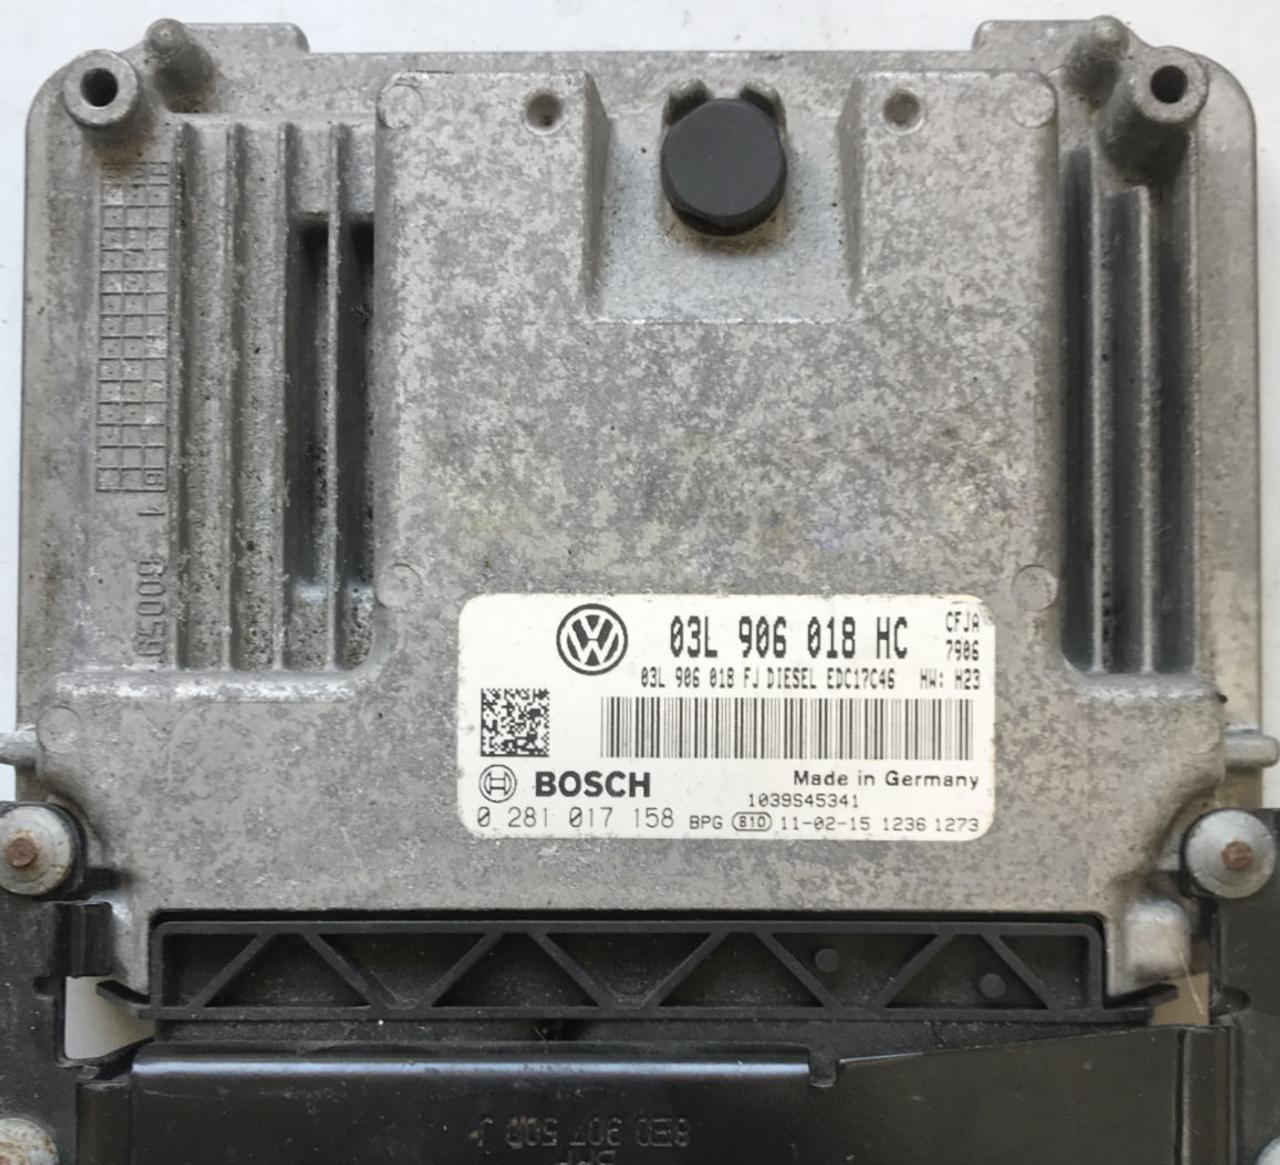 Seat Leon 2.0 TDI, 0281017158, 0 281 017 158, 03L906018HC, 03L 906 018 HC, EDC17C46